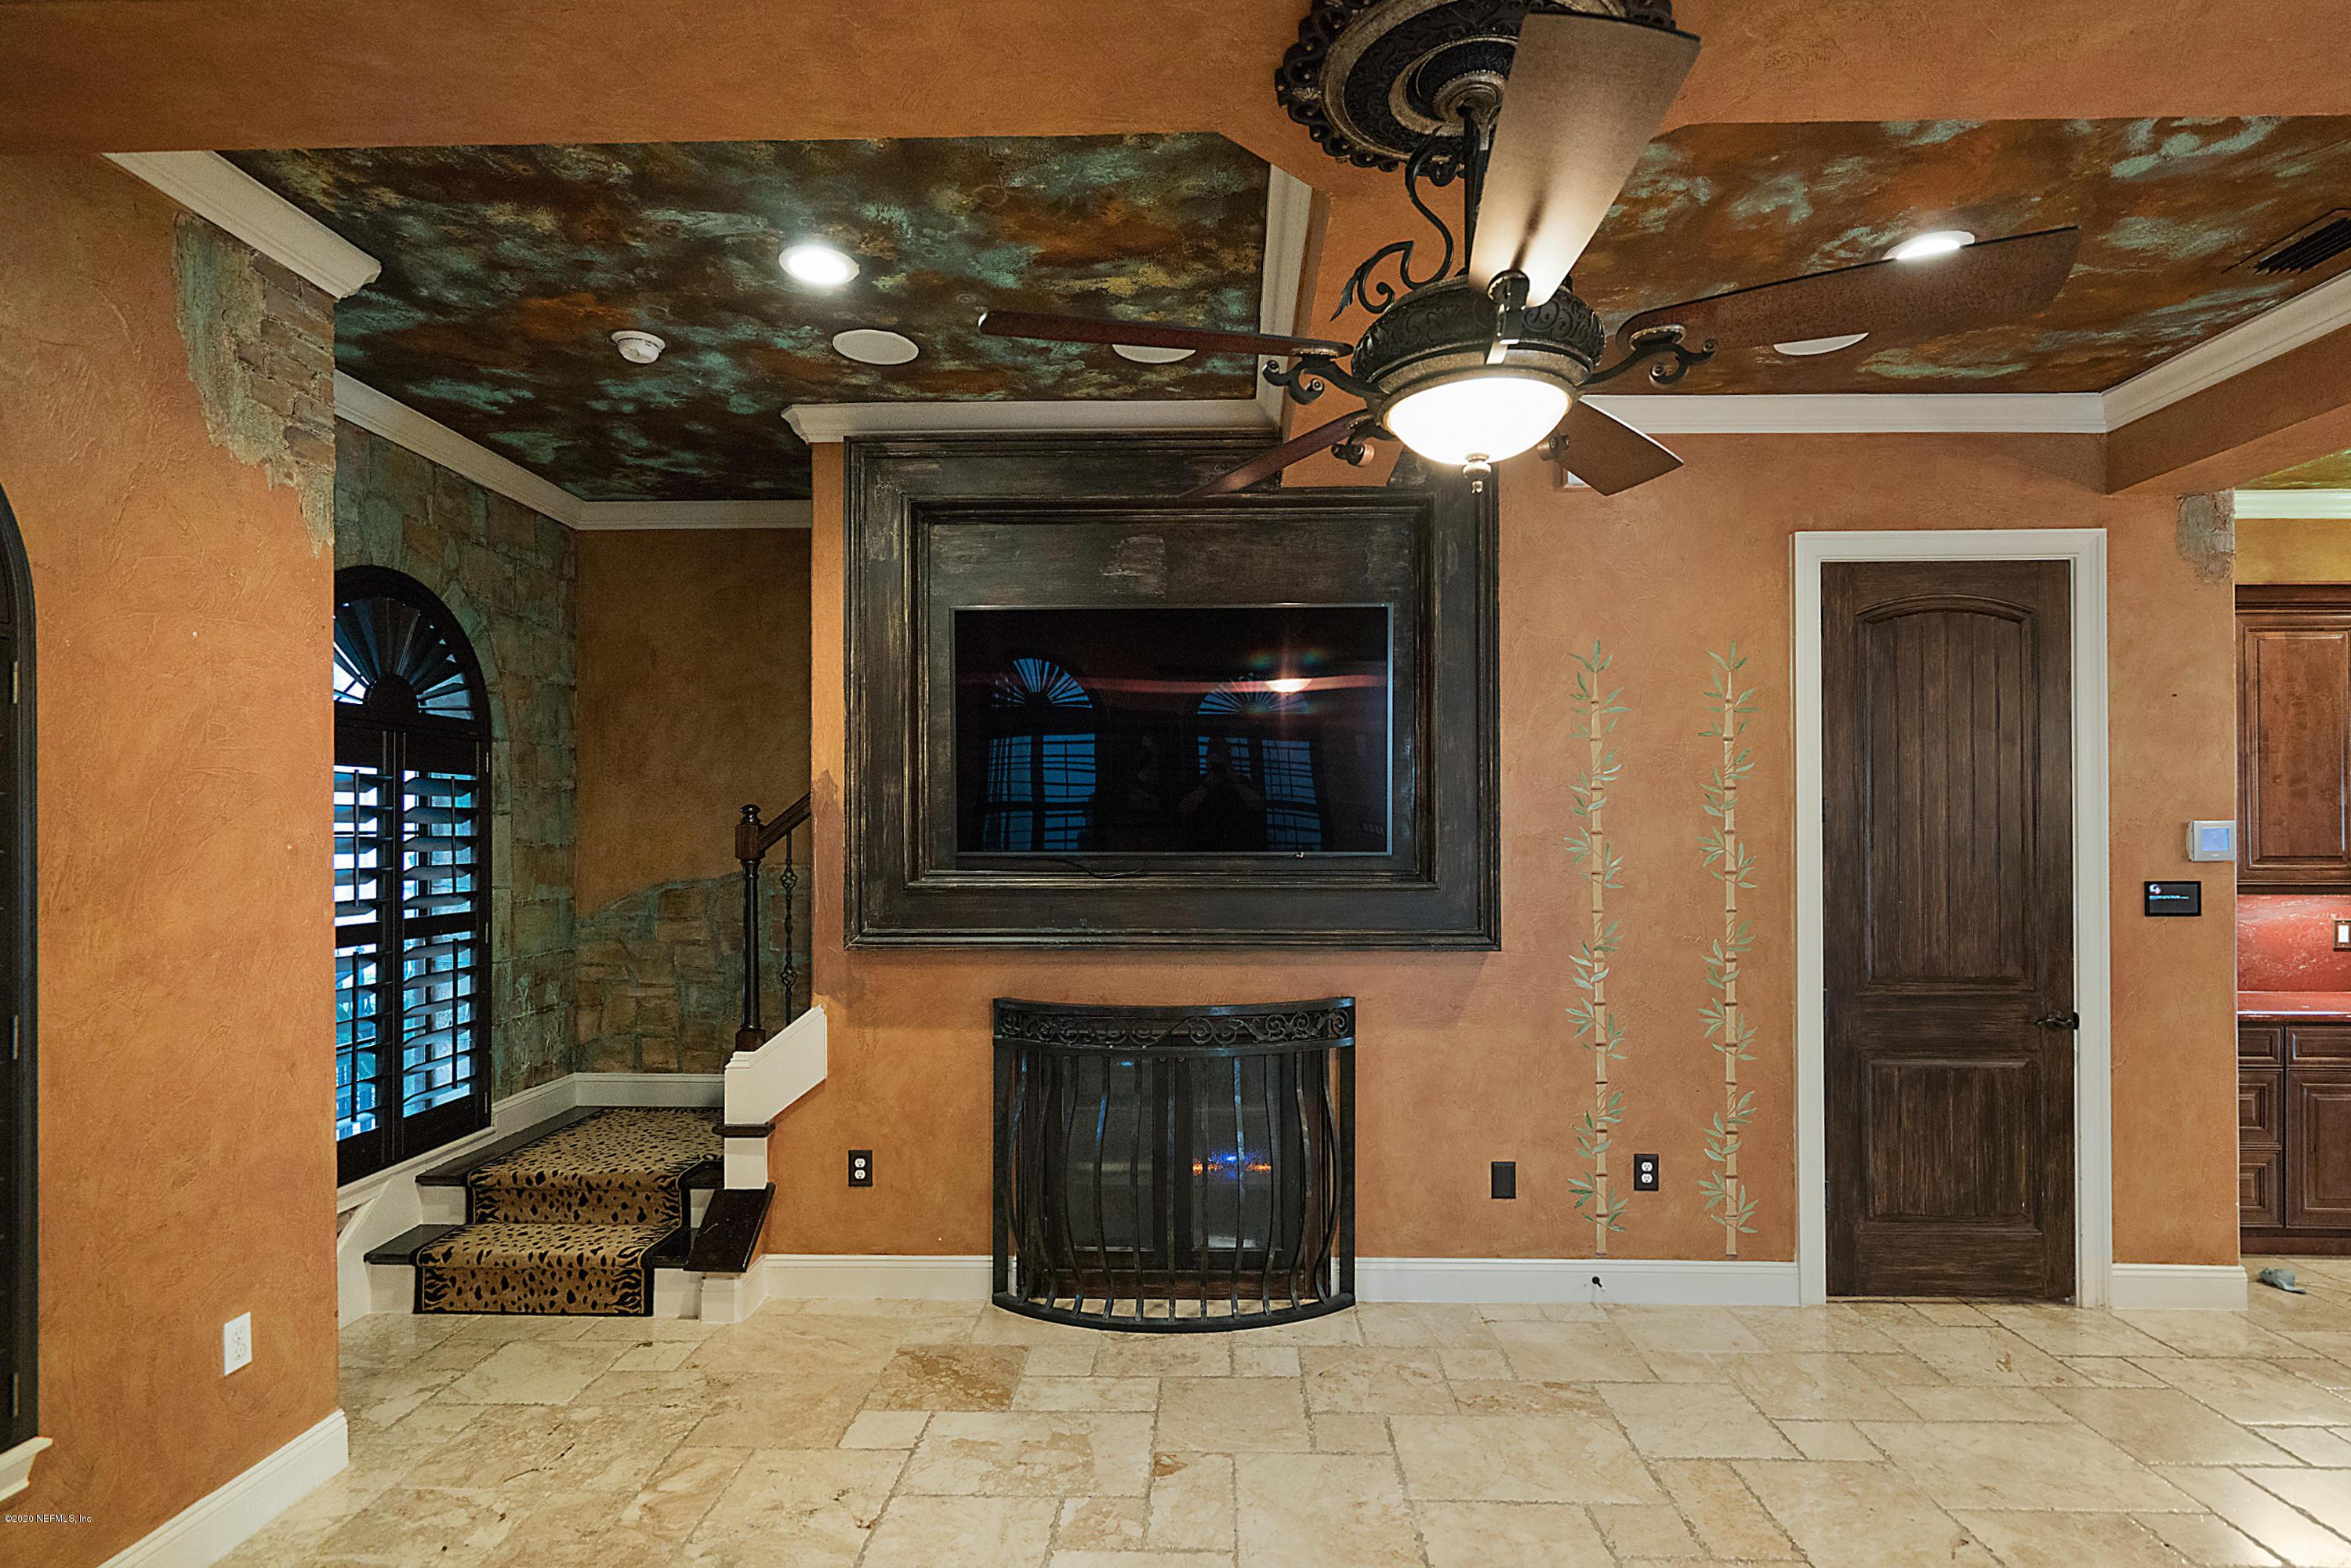 8849 LA TERRAZZA, JACKSONVILLE, FLORIDA 32217, 3 Bedrooms Bedrooms, ,2 BathroomsBathrooms,Residential,For sale,LA TERRAZZA,1079717